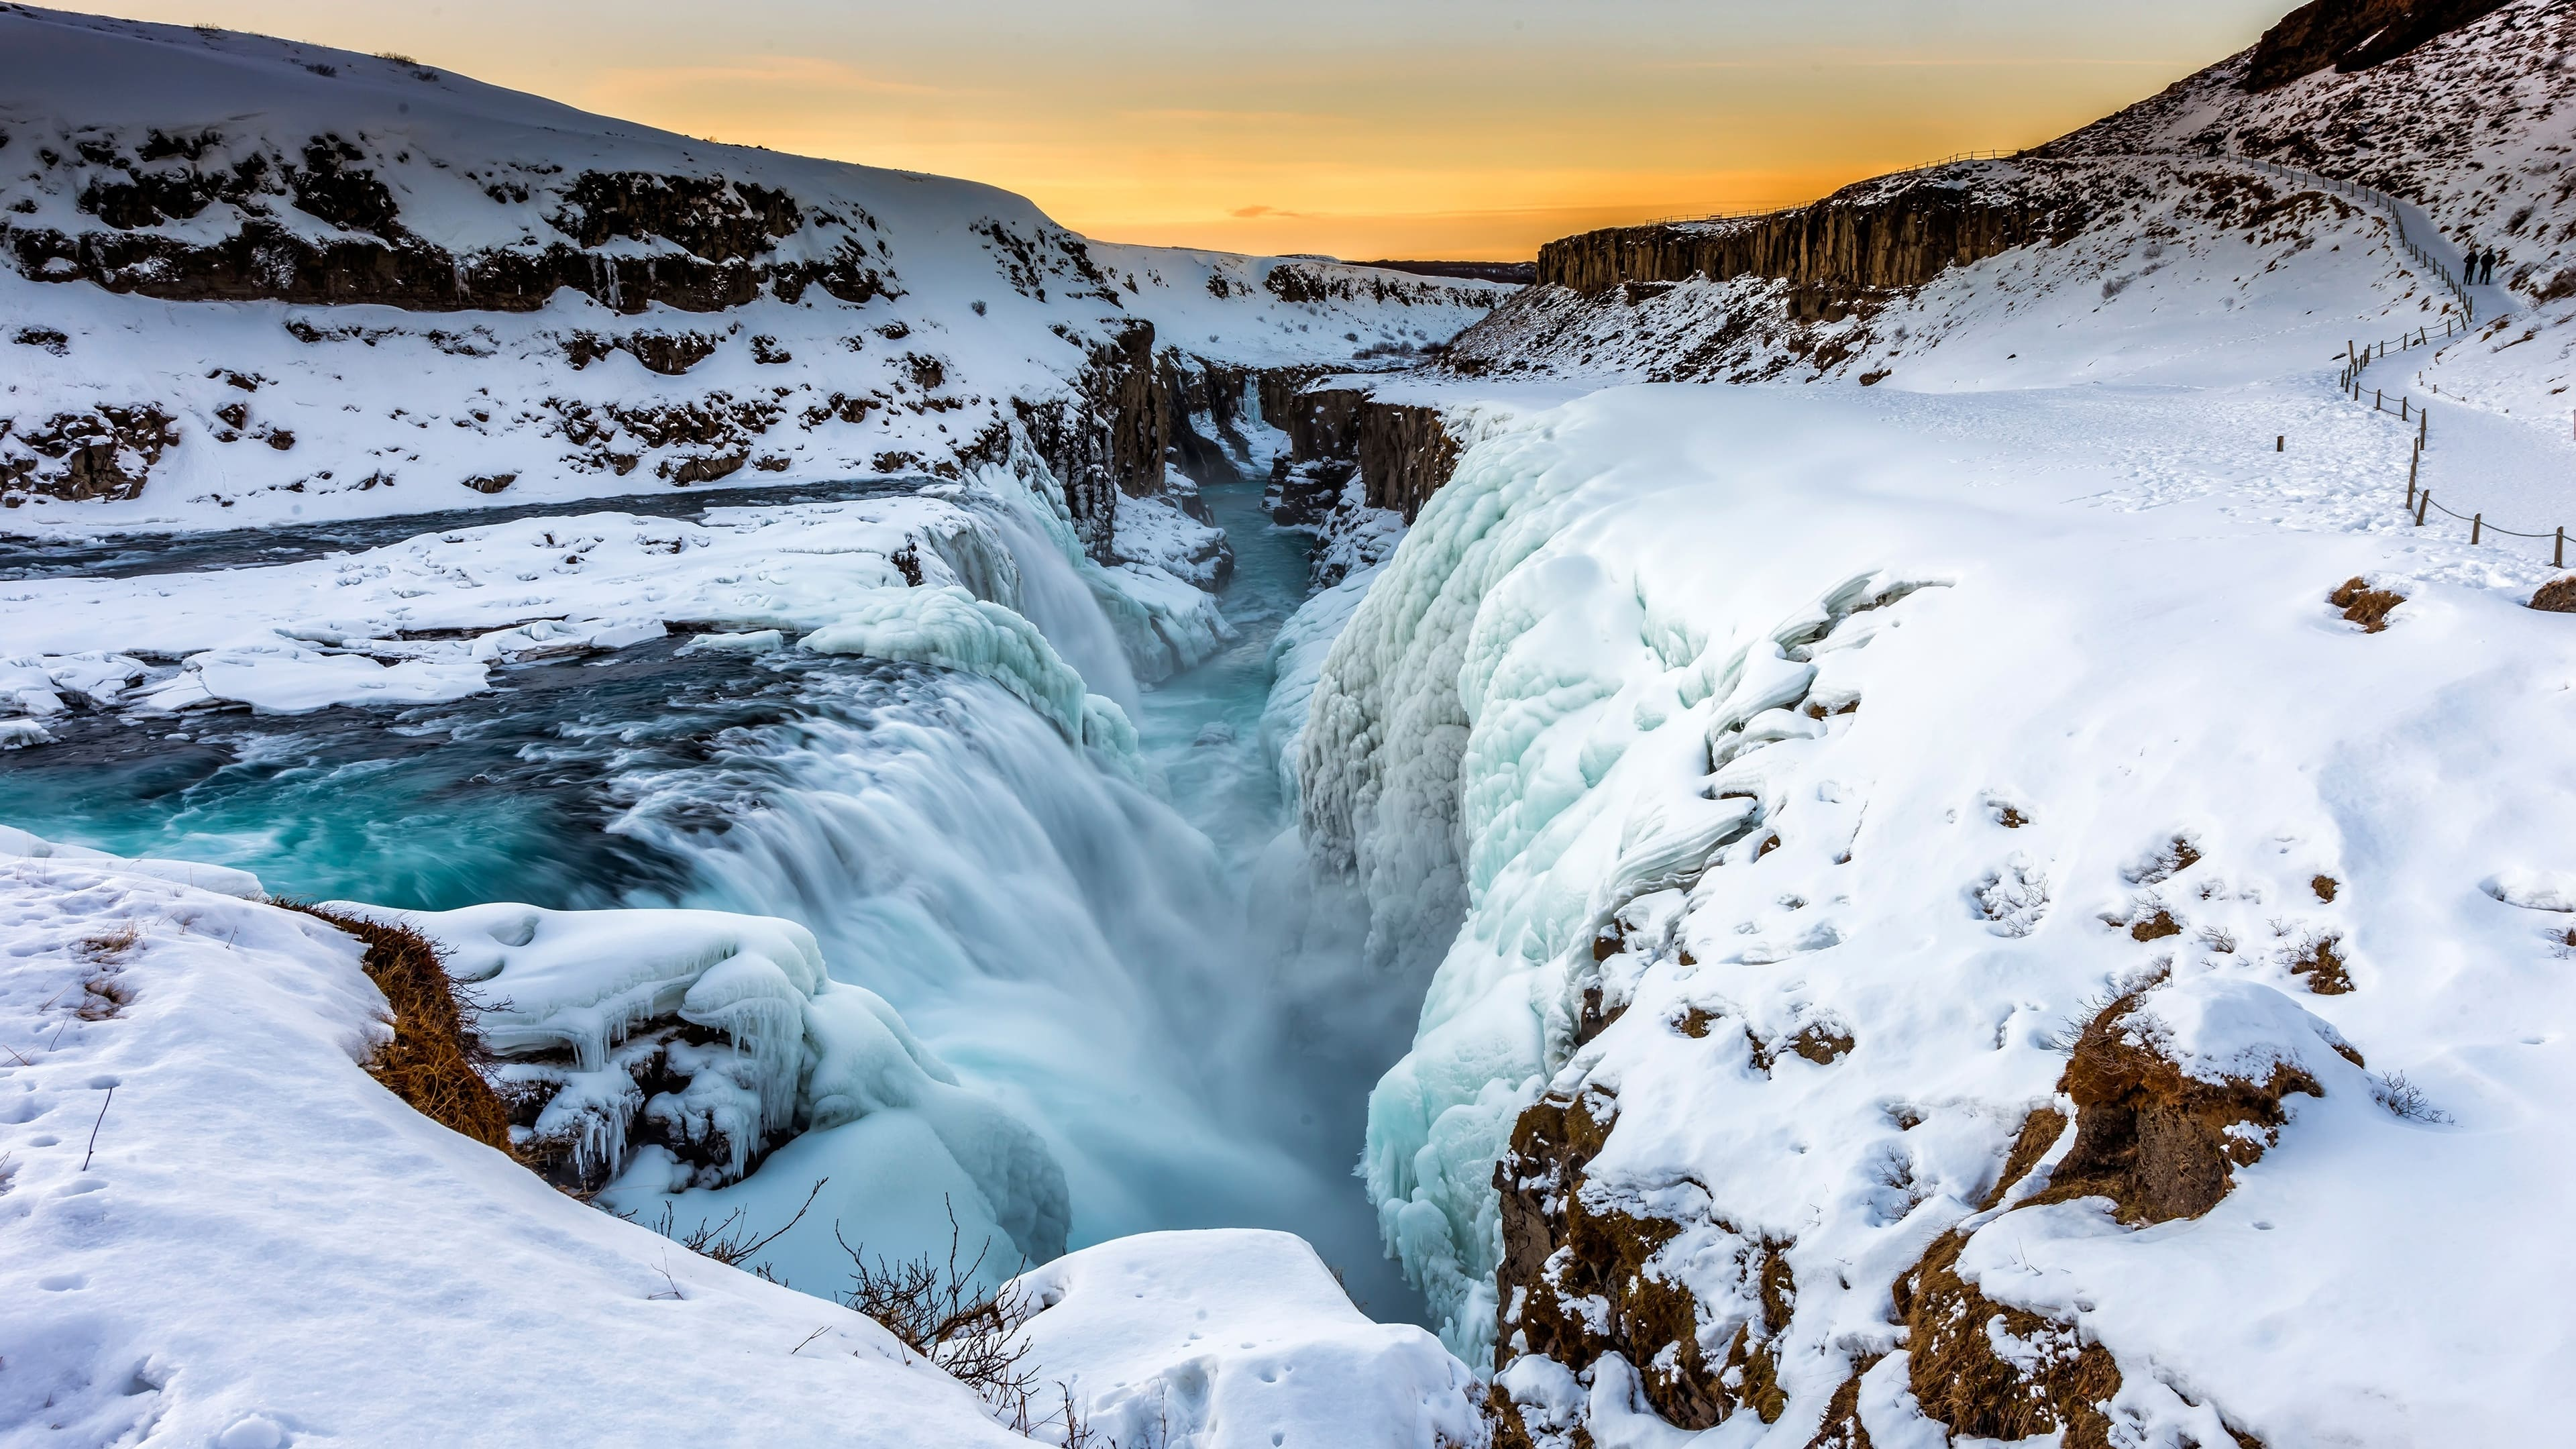 HDoboi.Kiev.ua - Обои на айфон водопад замерзший у берегов Исландии